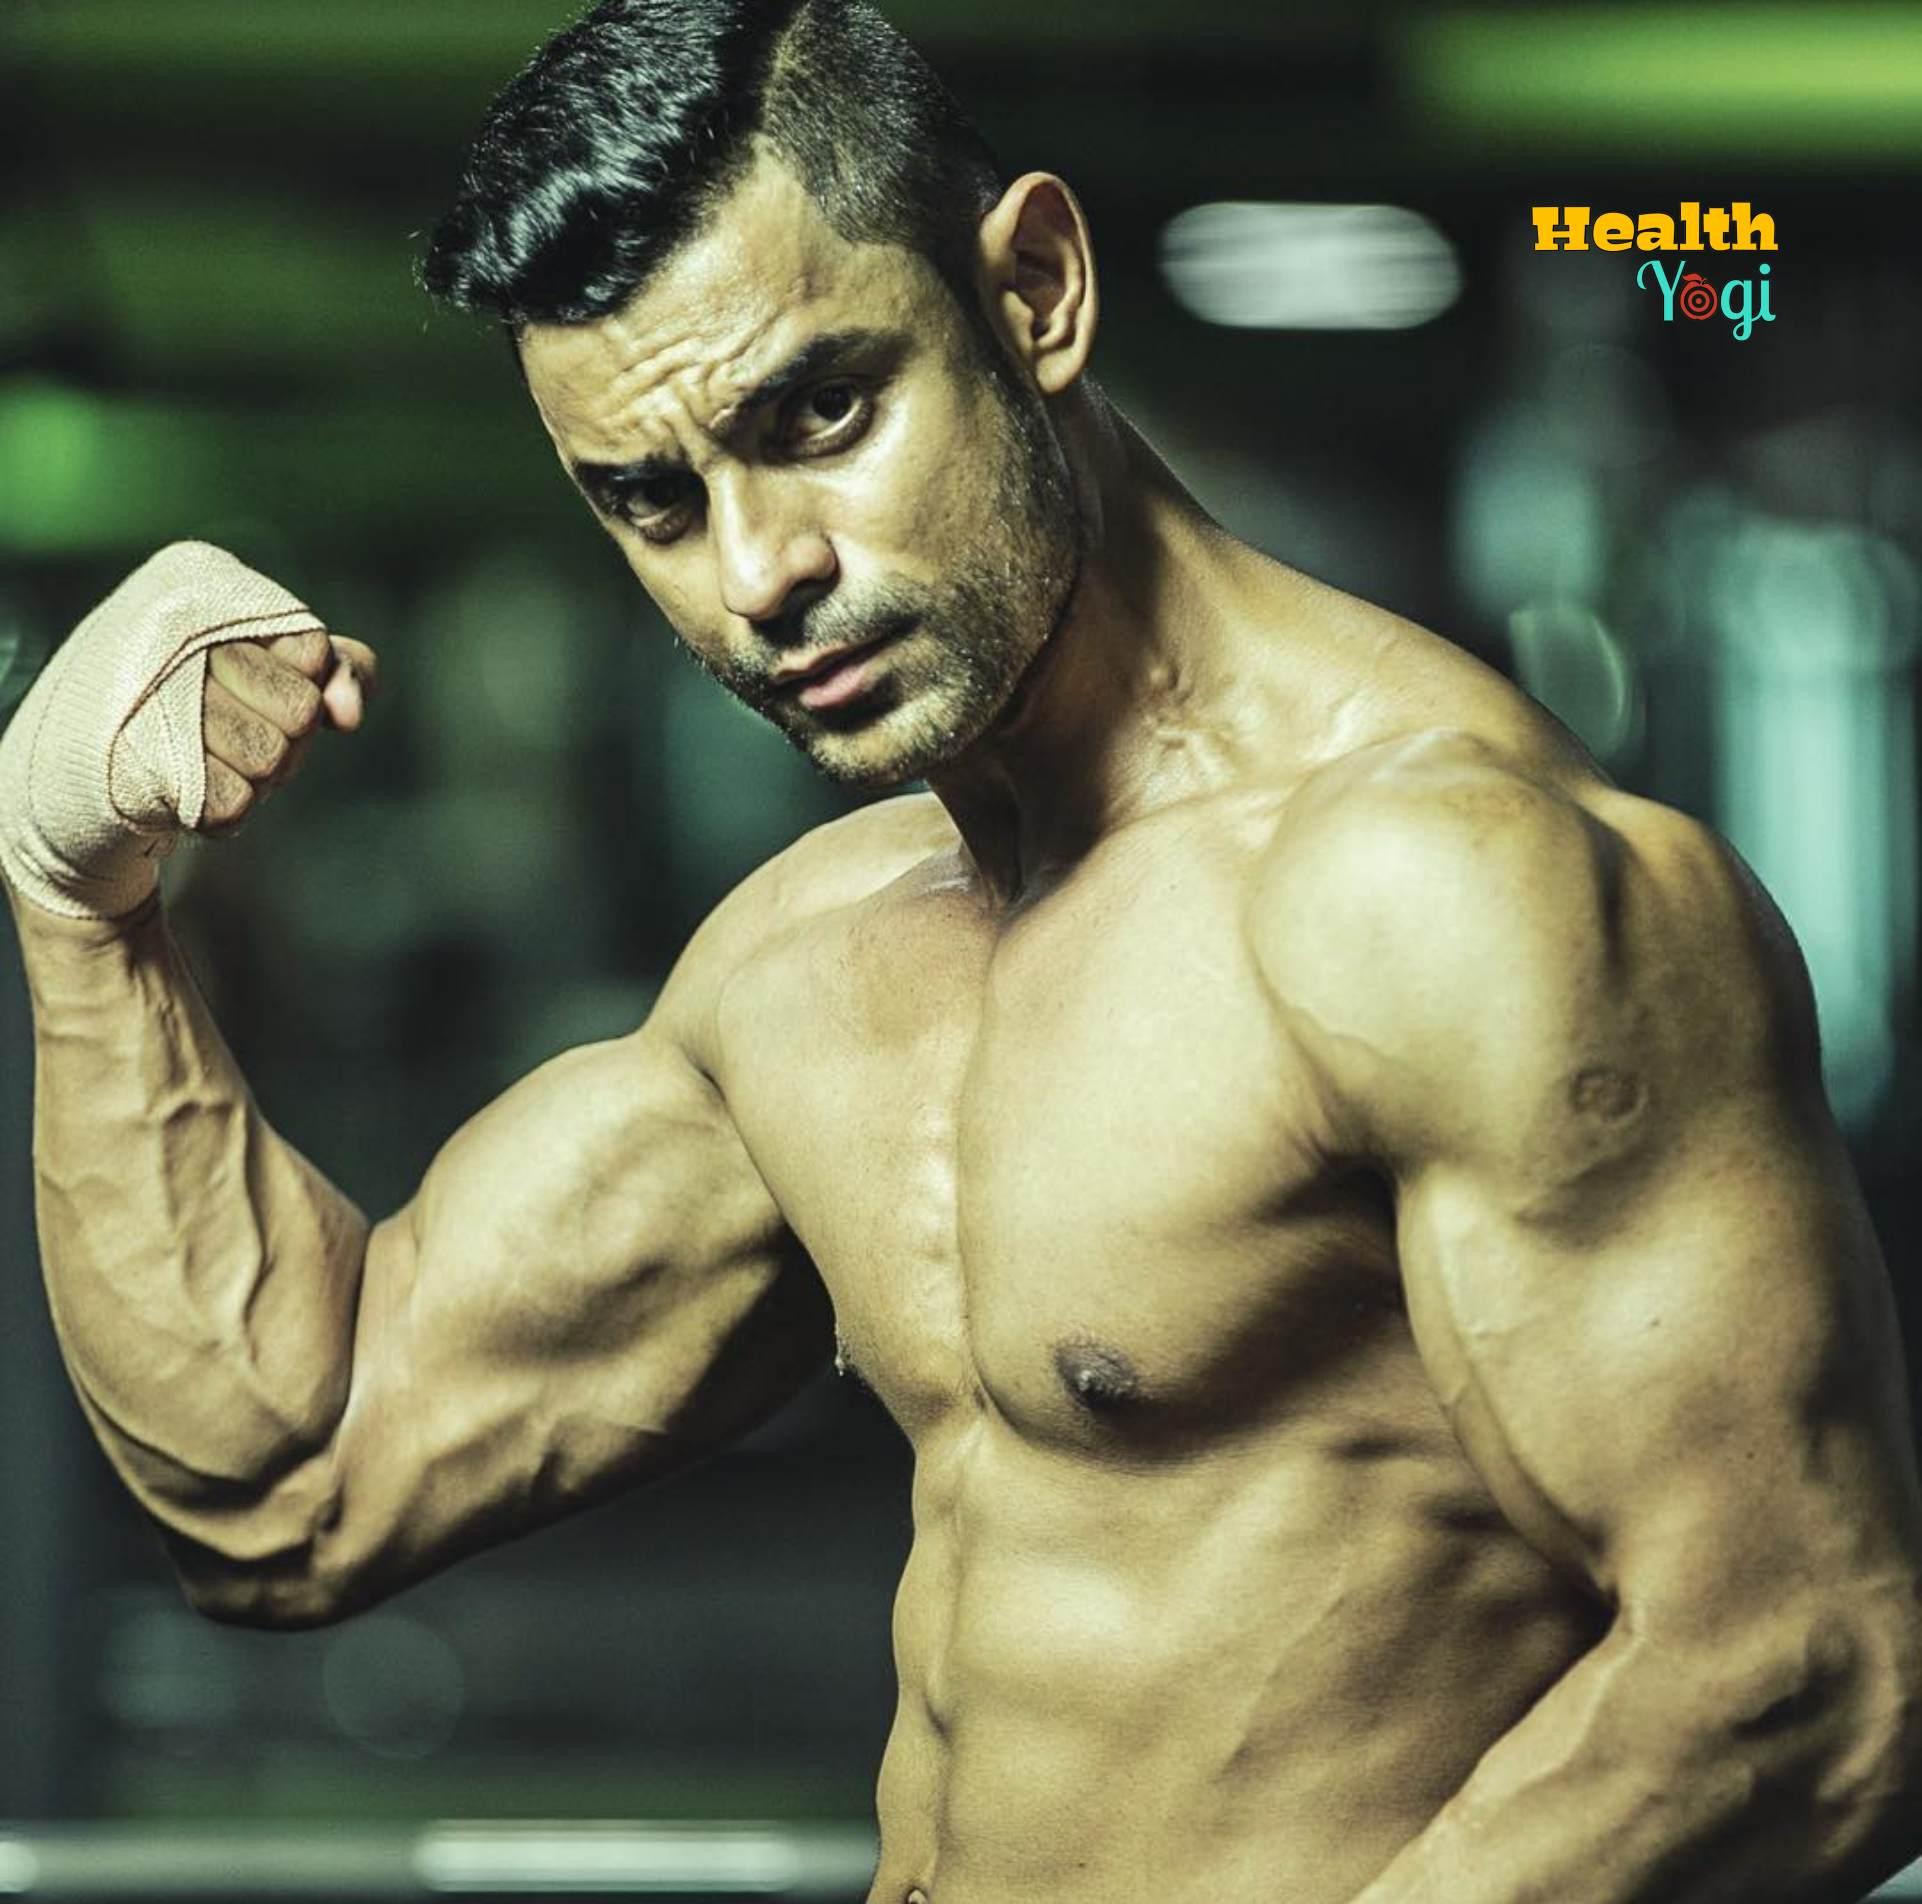 Bishnu Adhikari Workout Routine and Diet Plan | Body Statistics